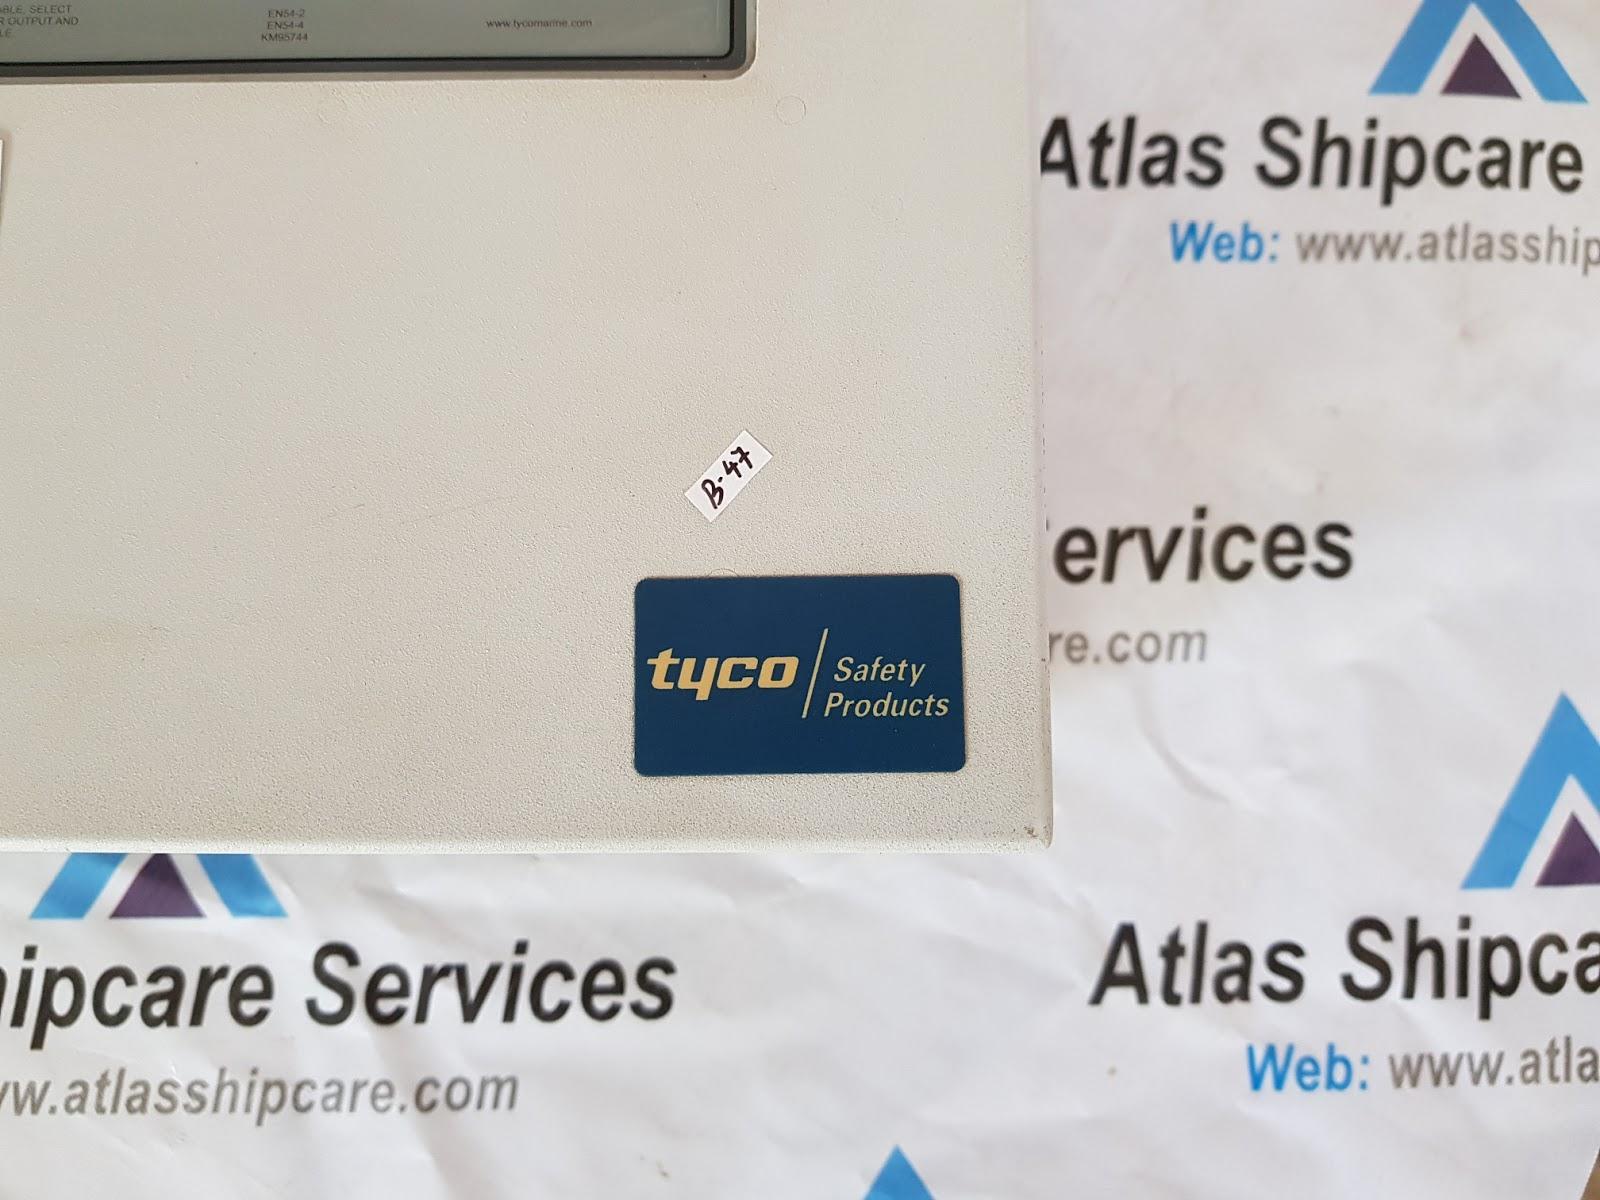 TYCO T1232 32 ZONE PANEL FIRE ALARM CONTROLLERS | Atlas Shipcare